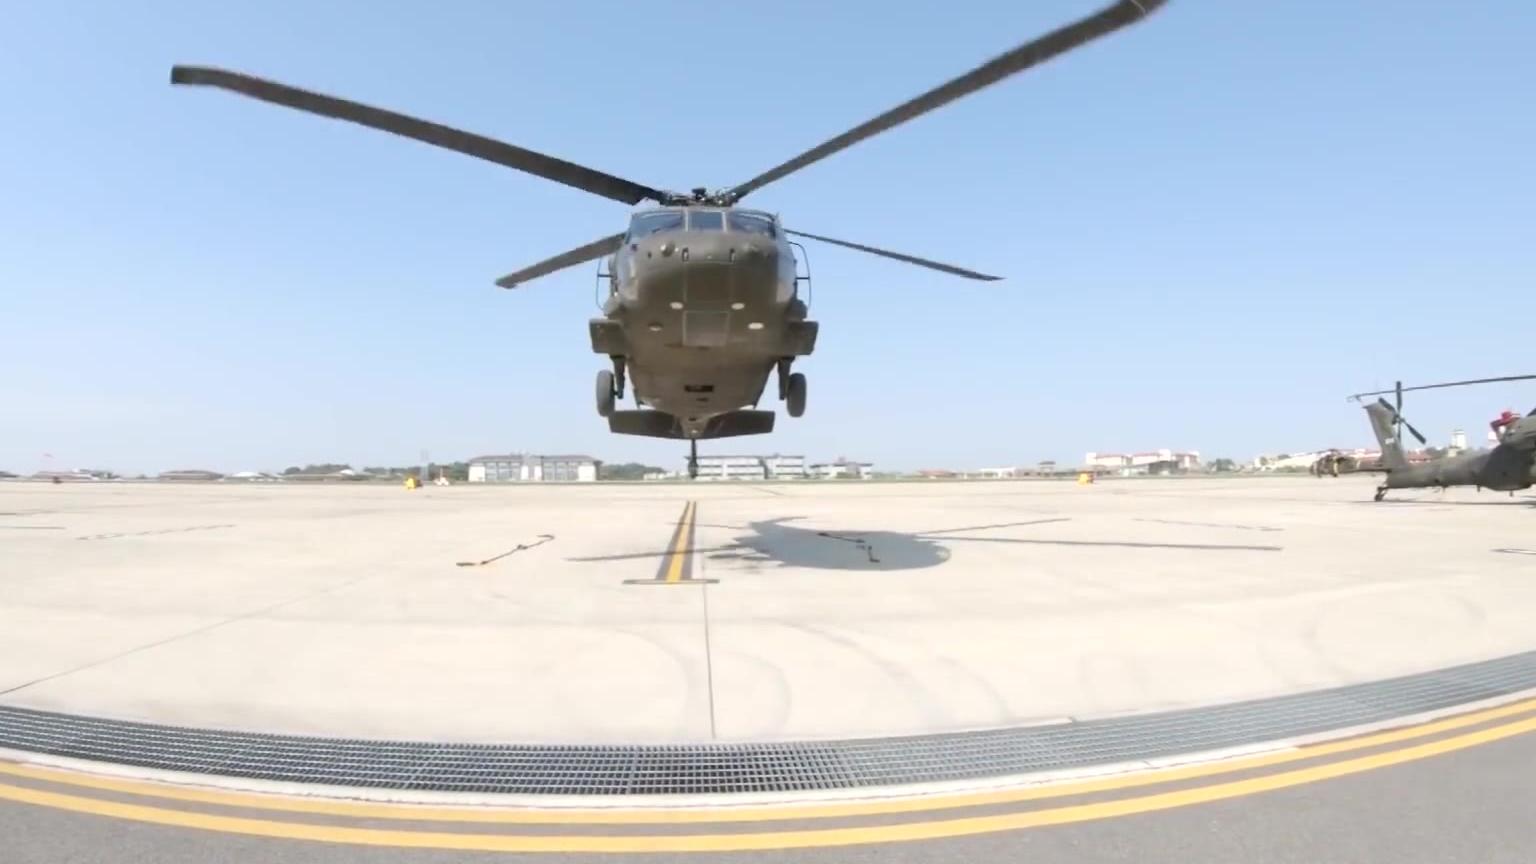 UH60L黑鹰发动机起动和起飞